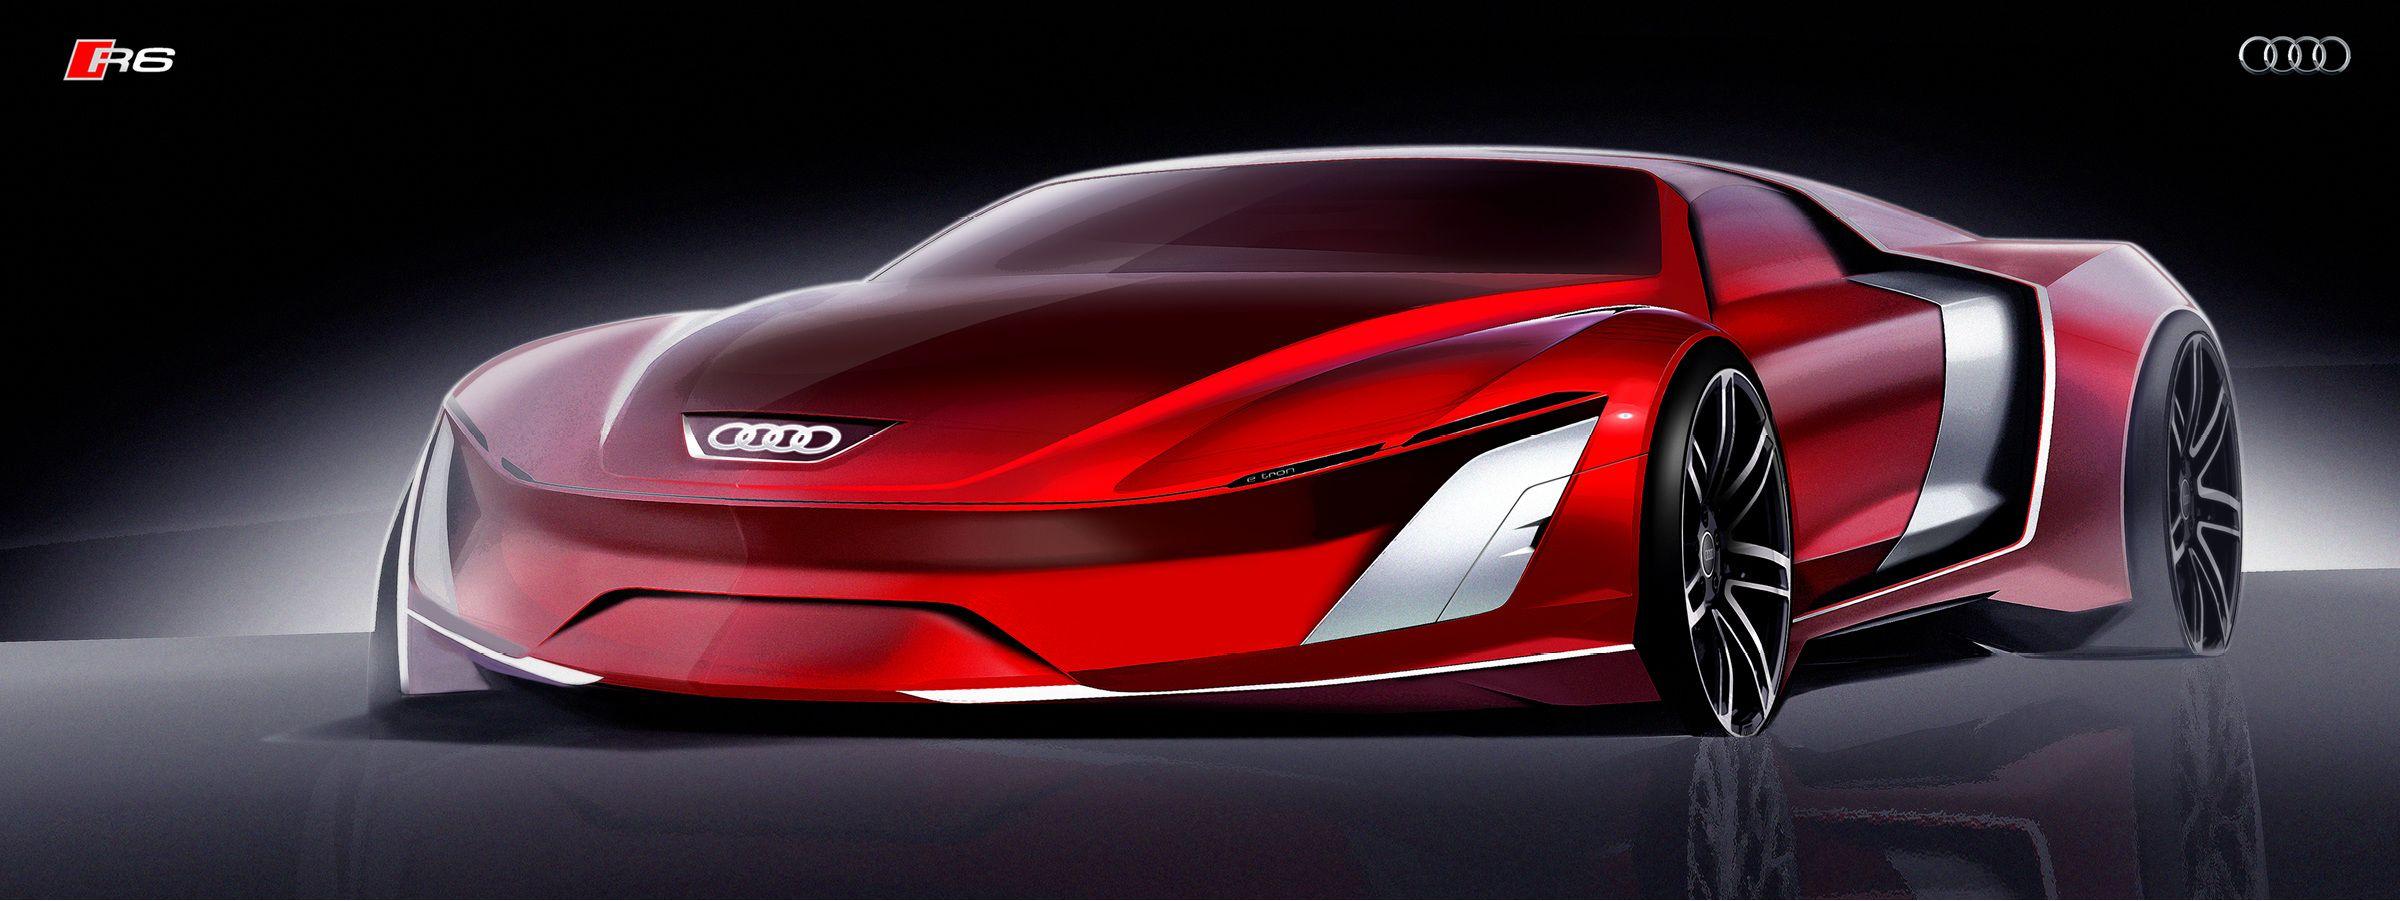 Audi R Richard Yoh CarSketches Pinterest Cars Car Sketch - Audi r6